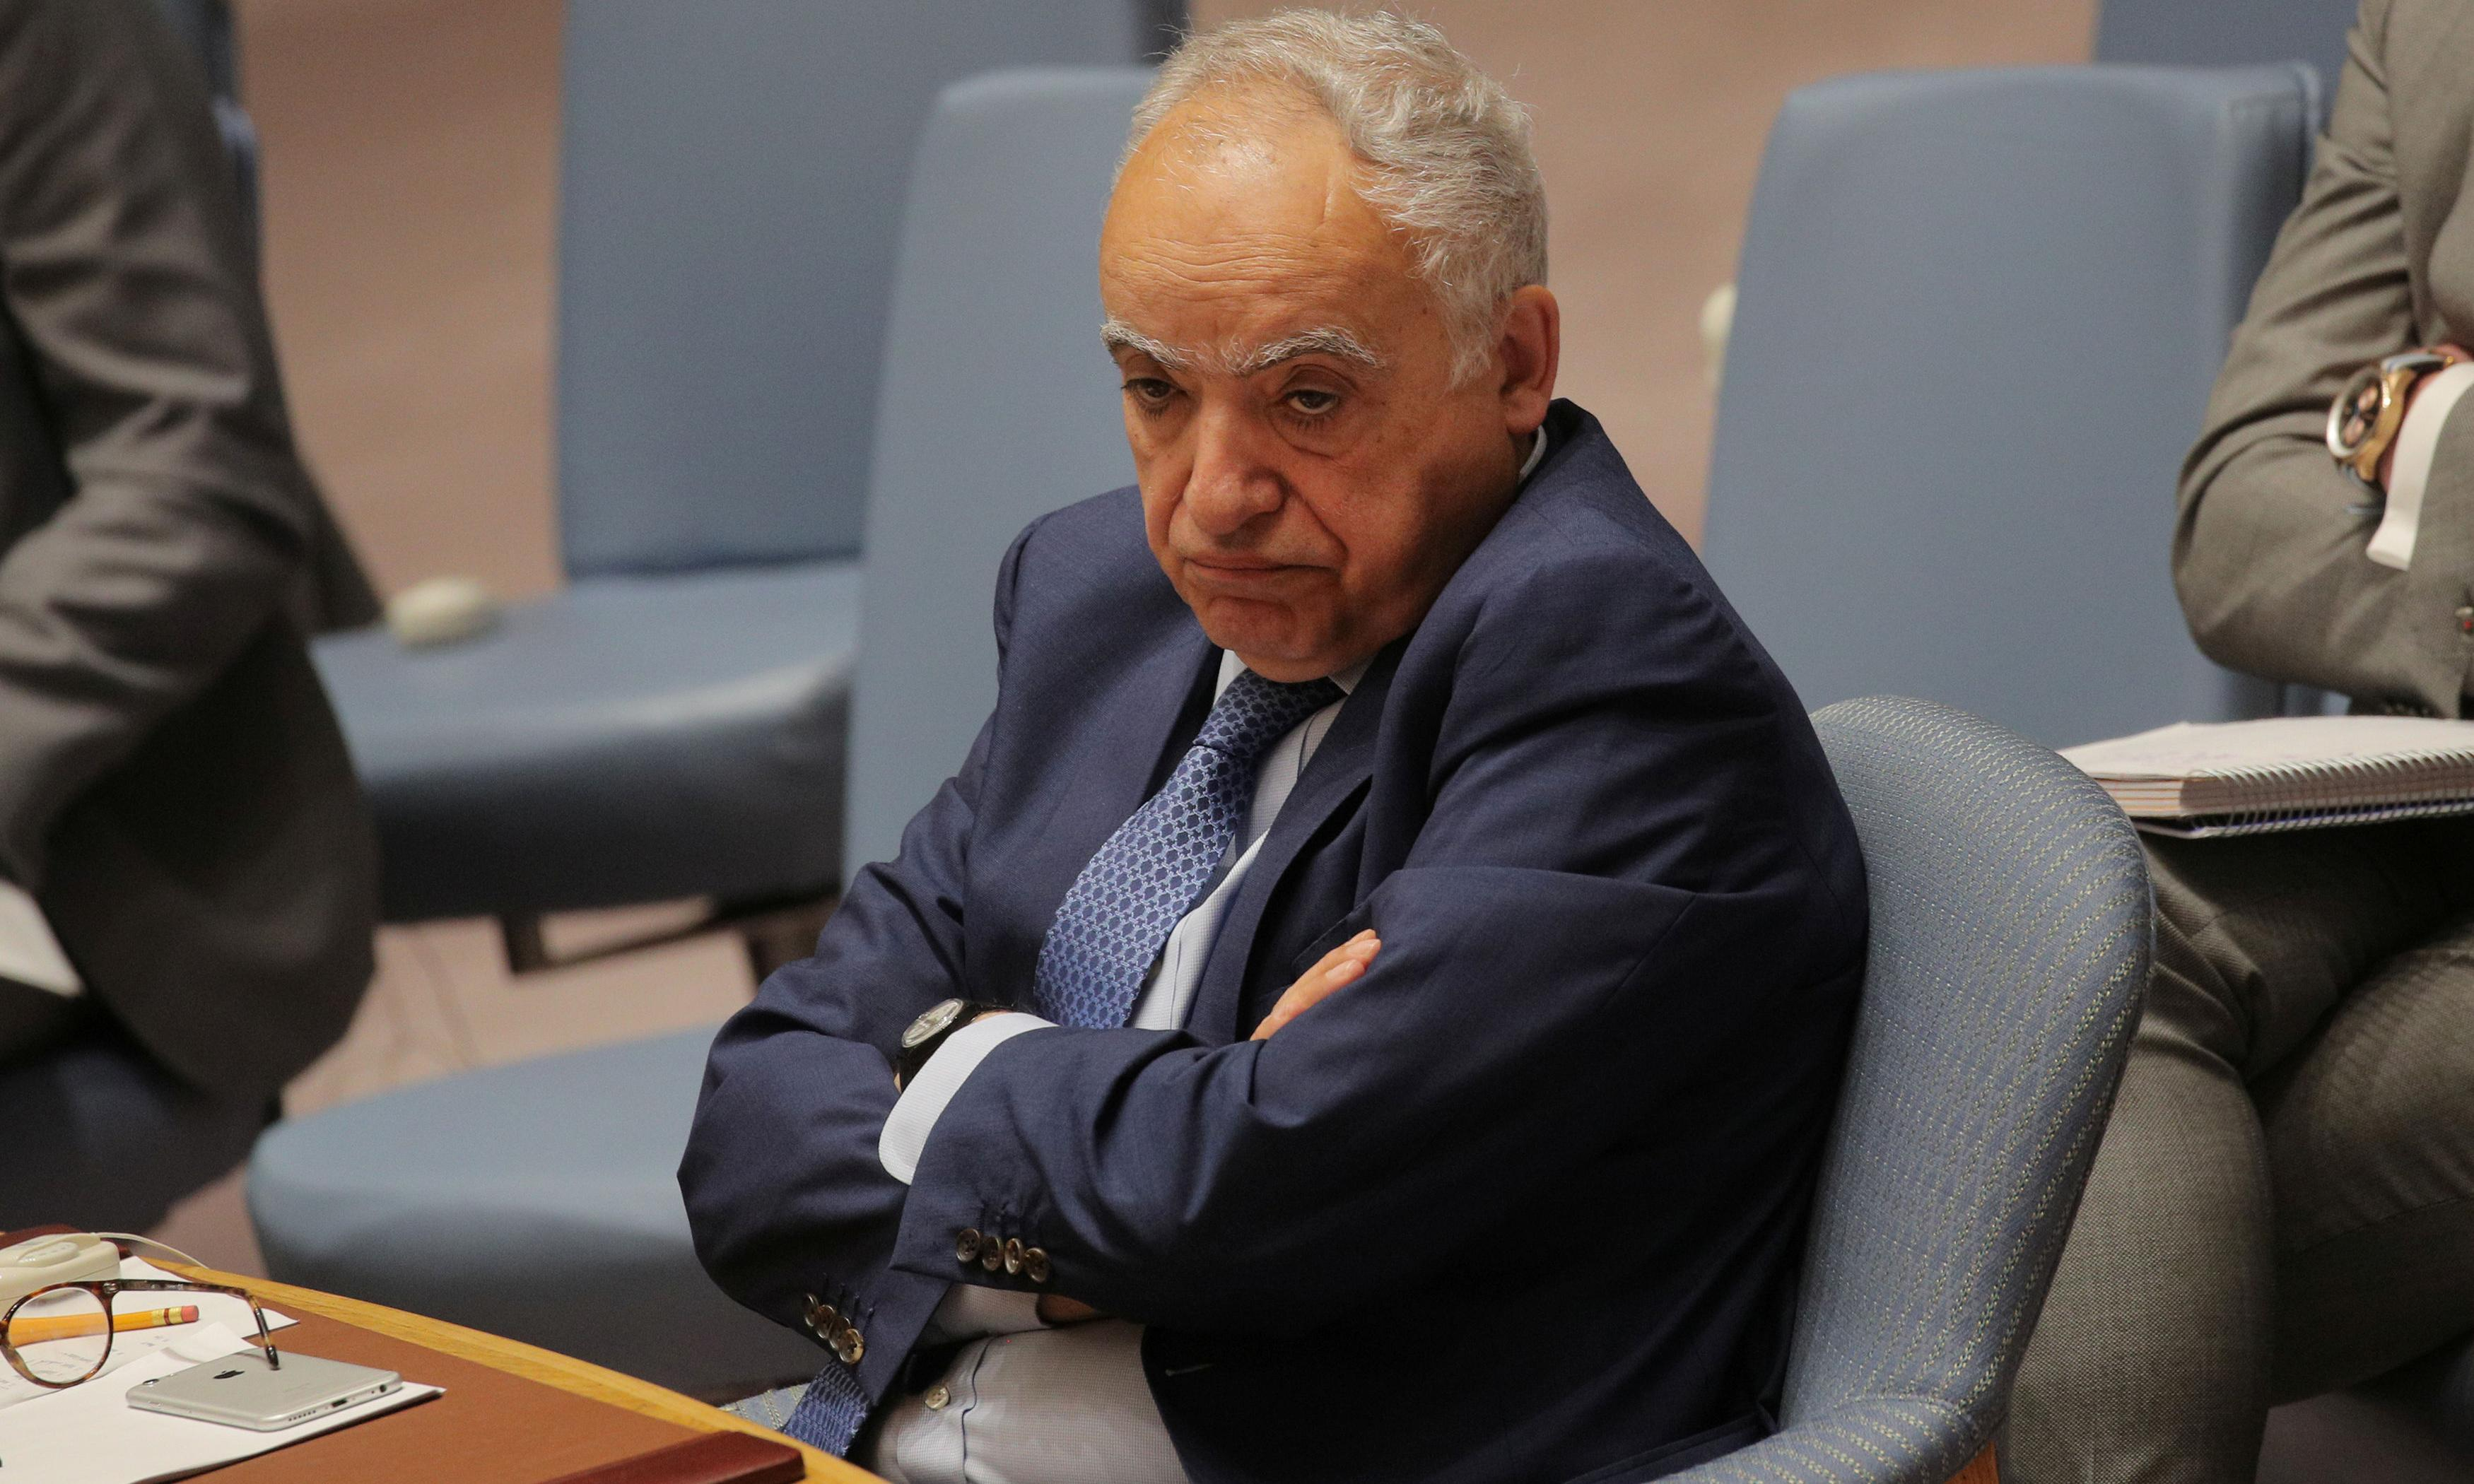 UN envoy attacks lack of 'moral motivation' to end Libyan war